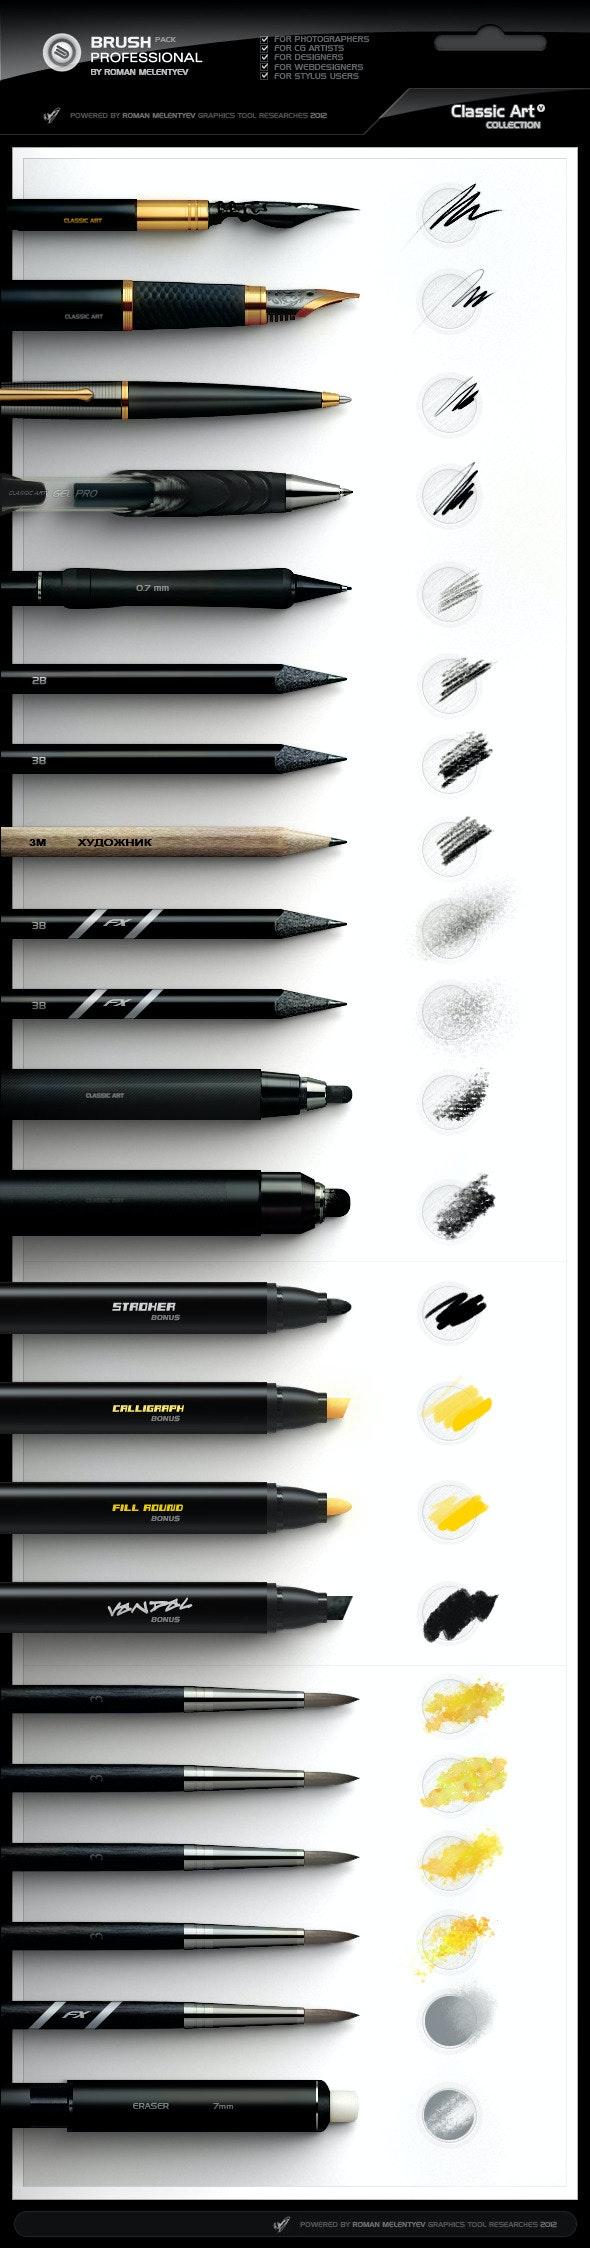 Brush Pack Professional volume 4 - Classic Art - Artistic Brushes